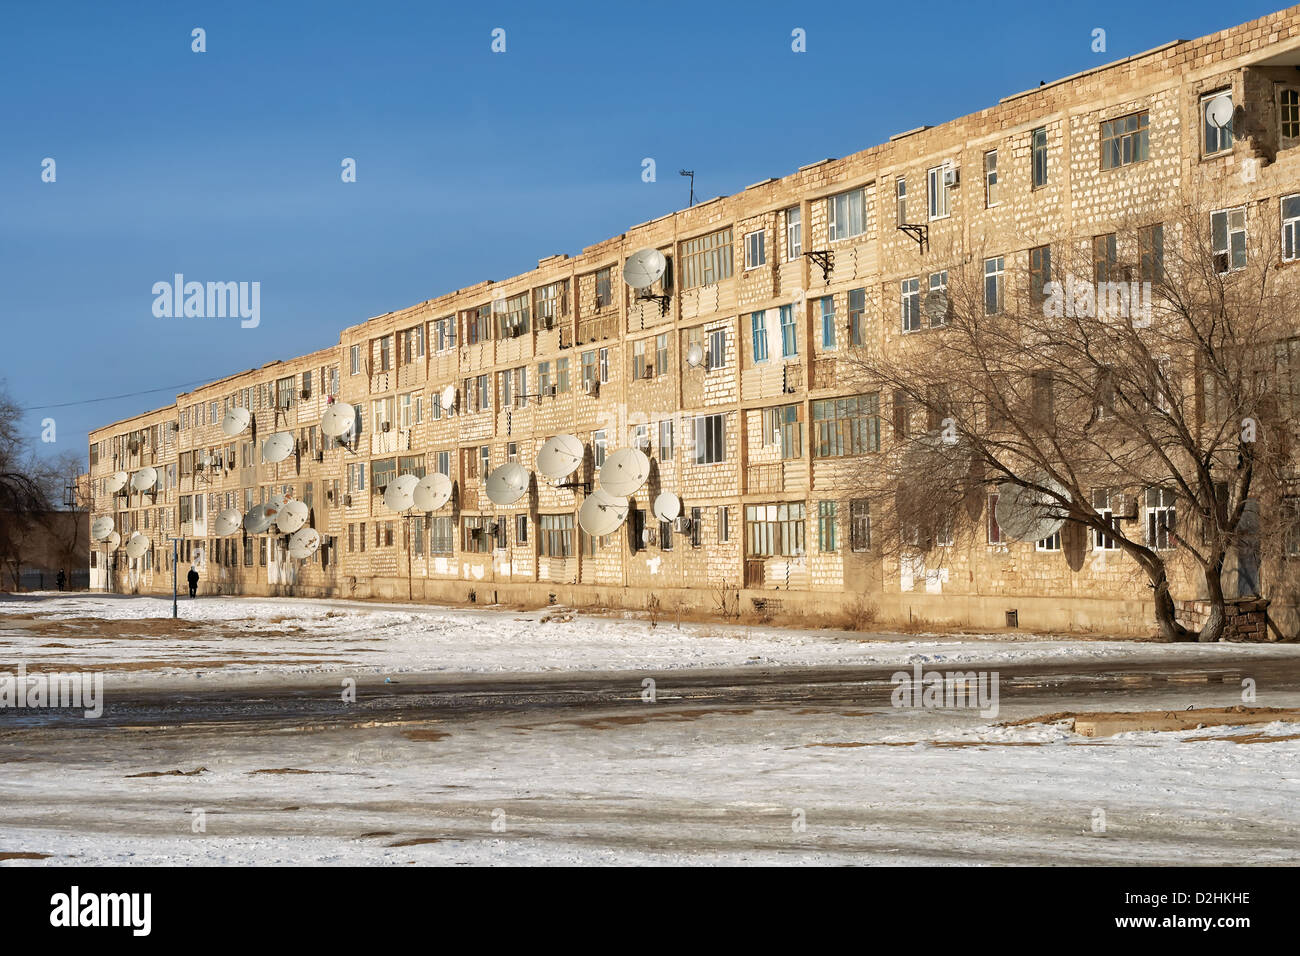 Unprepossessing Stockfotos & Unprepossessing Bilder - Alamy